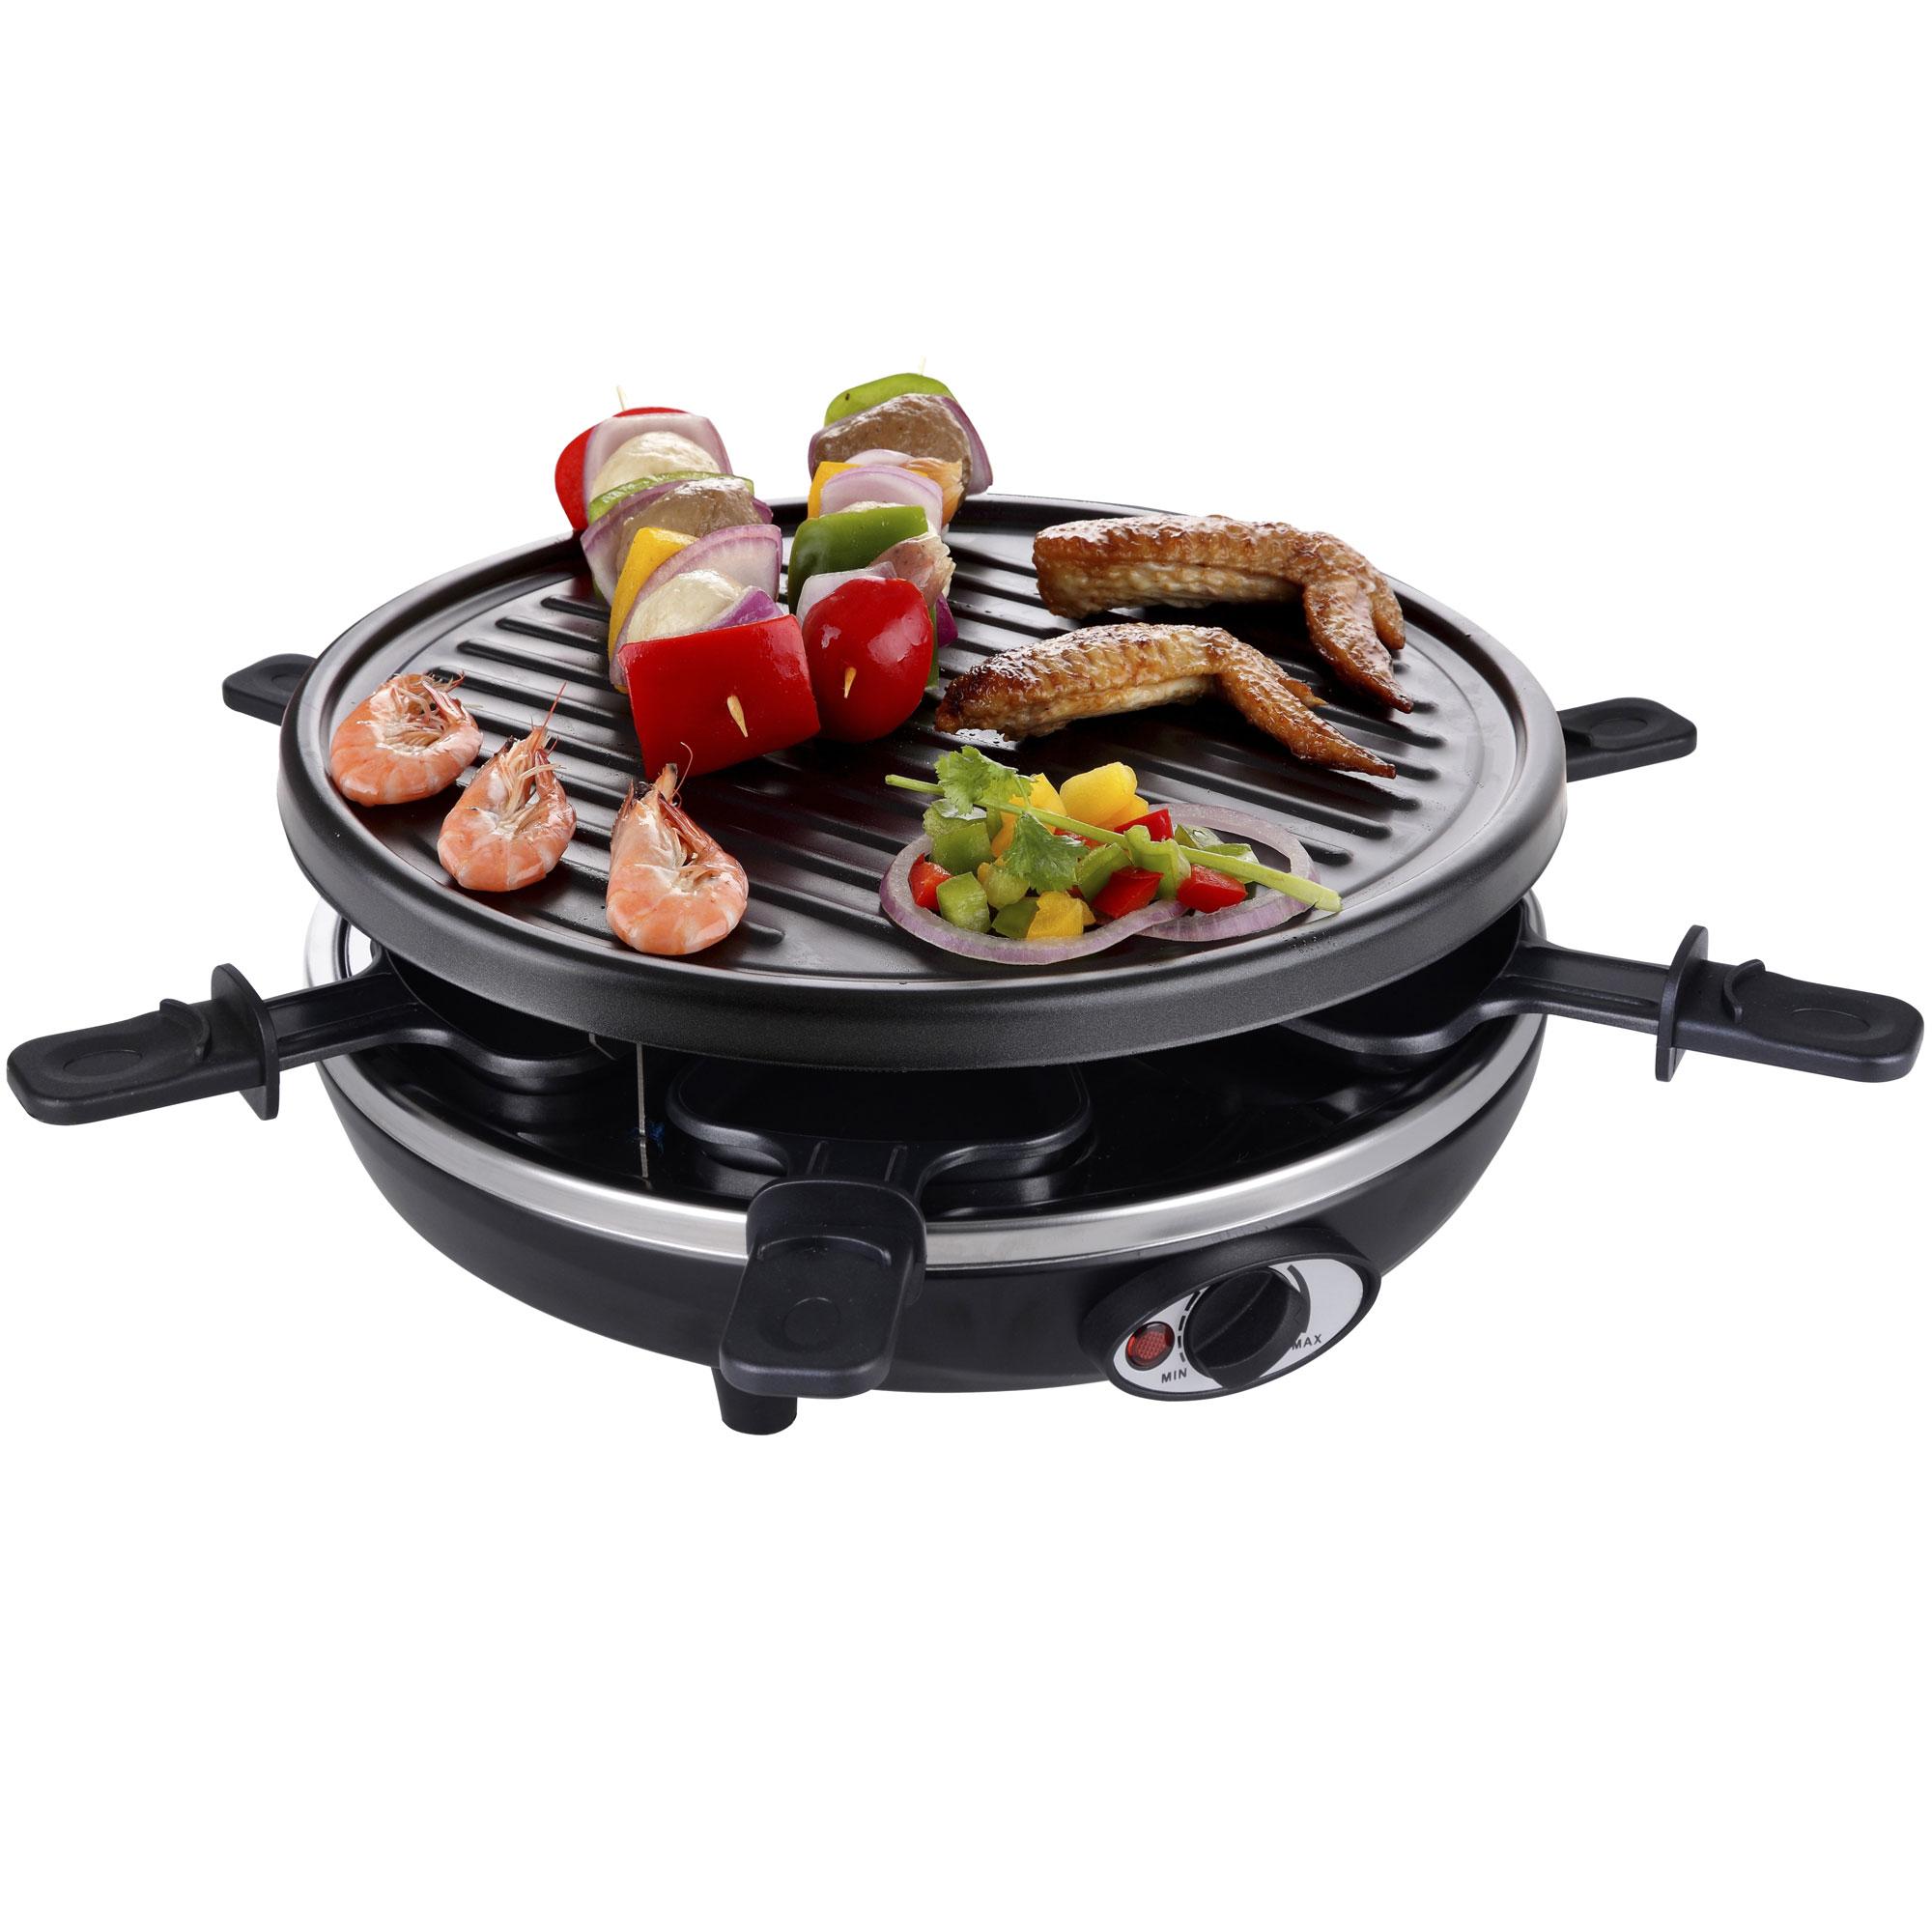 elektro raclette tischgrill pfannkuchen pancakemaker grill. Black Bedroom Furniture Sets. Home Design Ideas